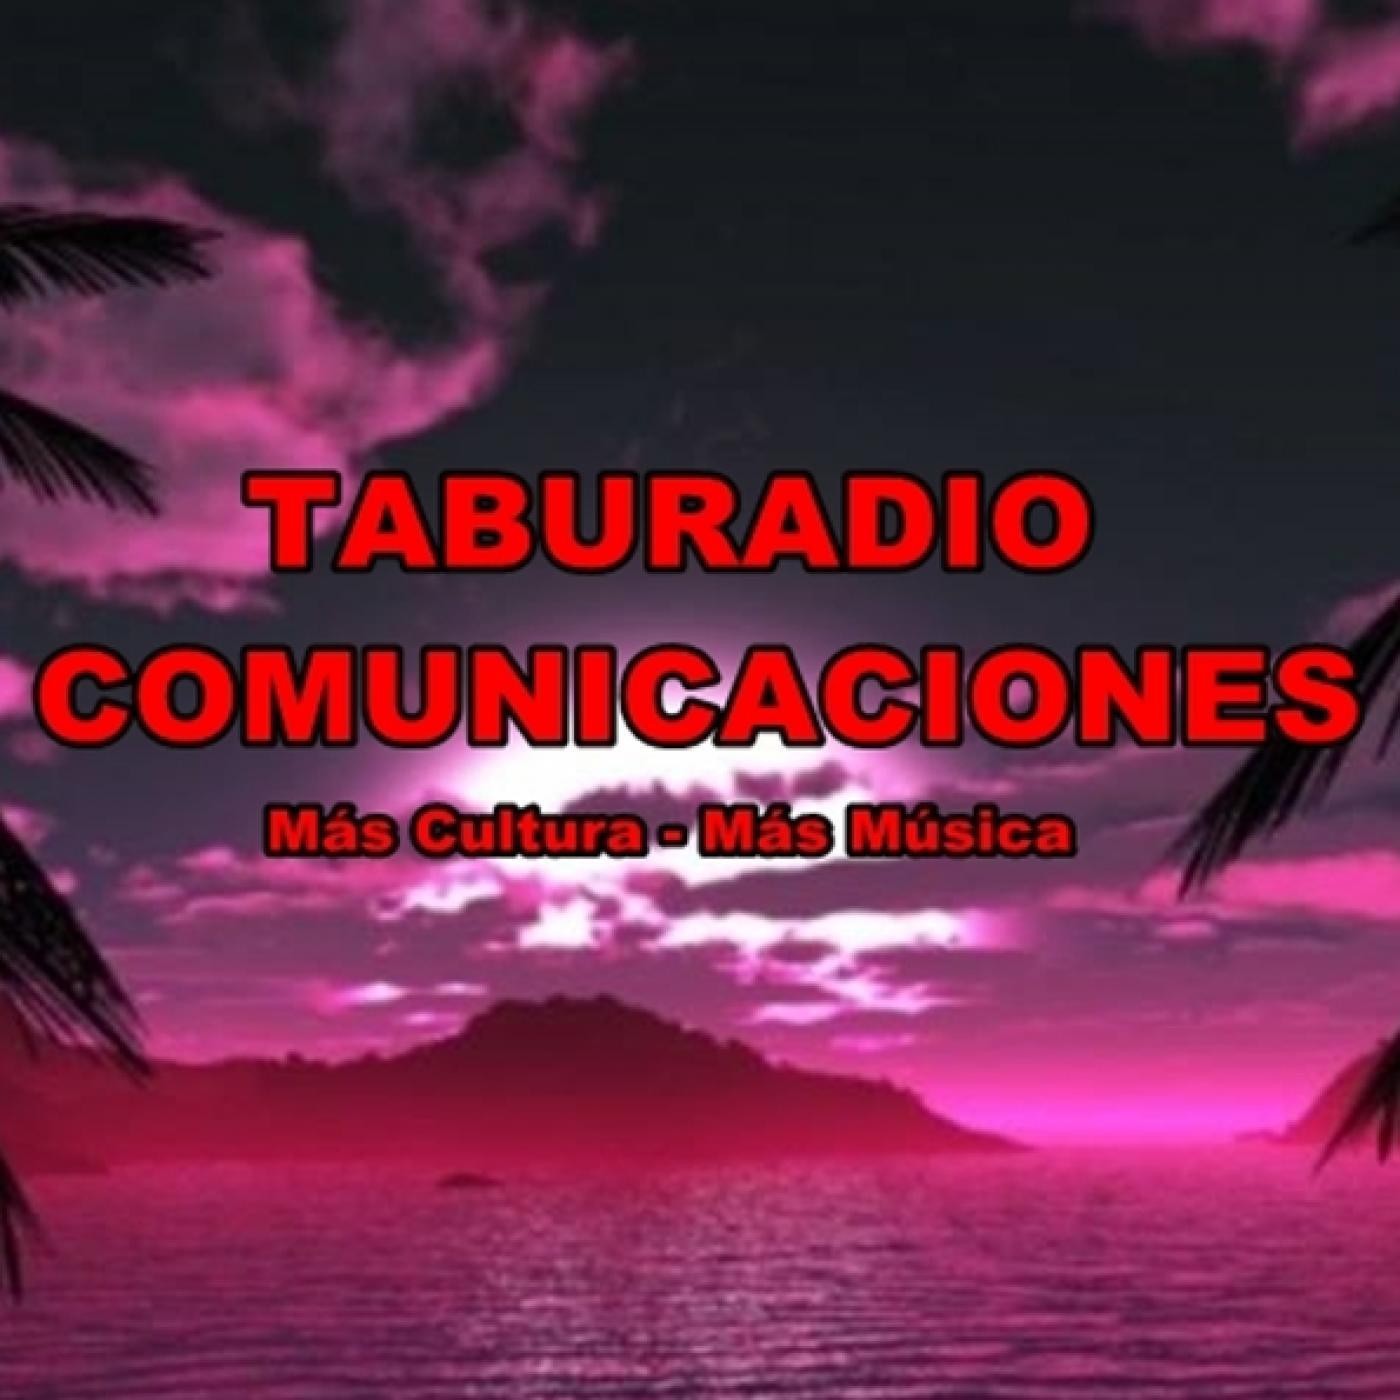 TABURADIO COMUNICACIONES